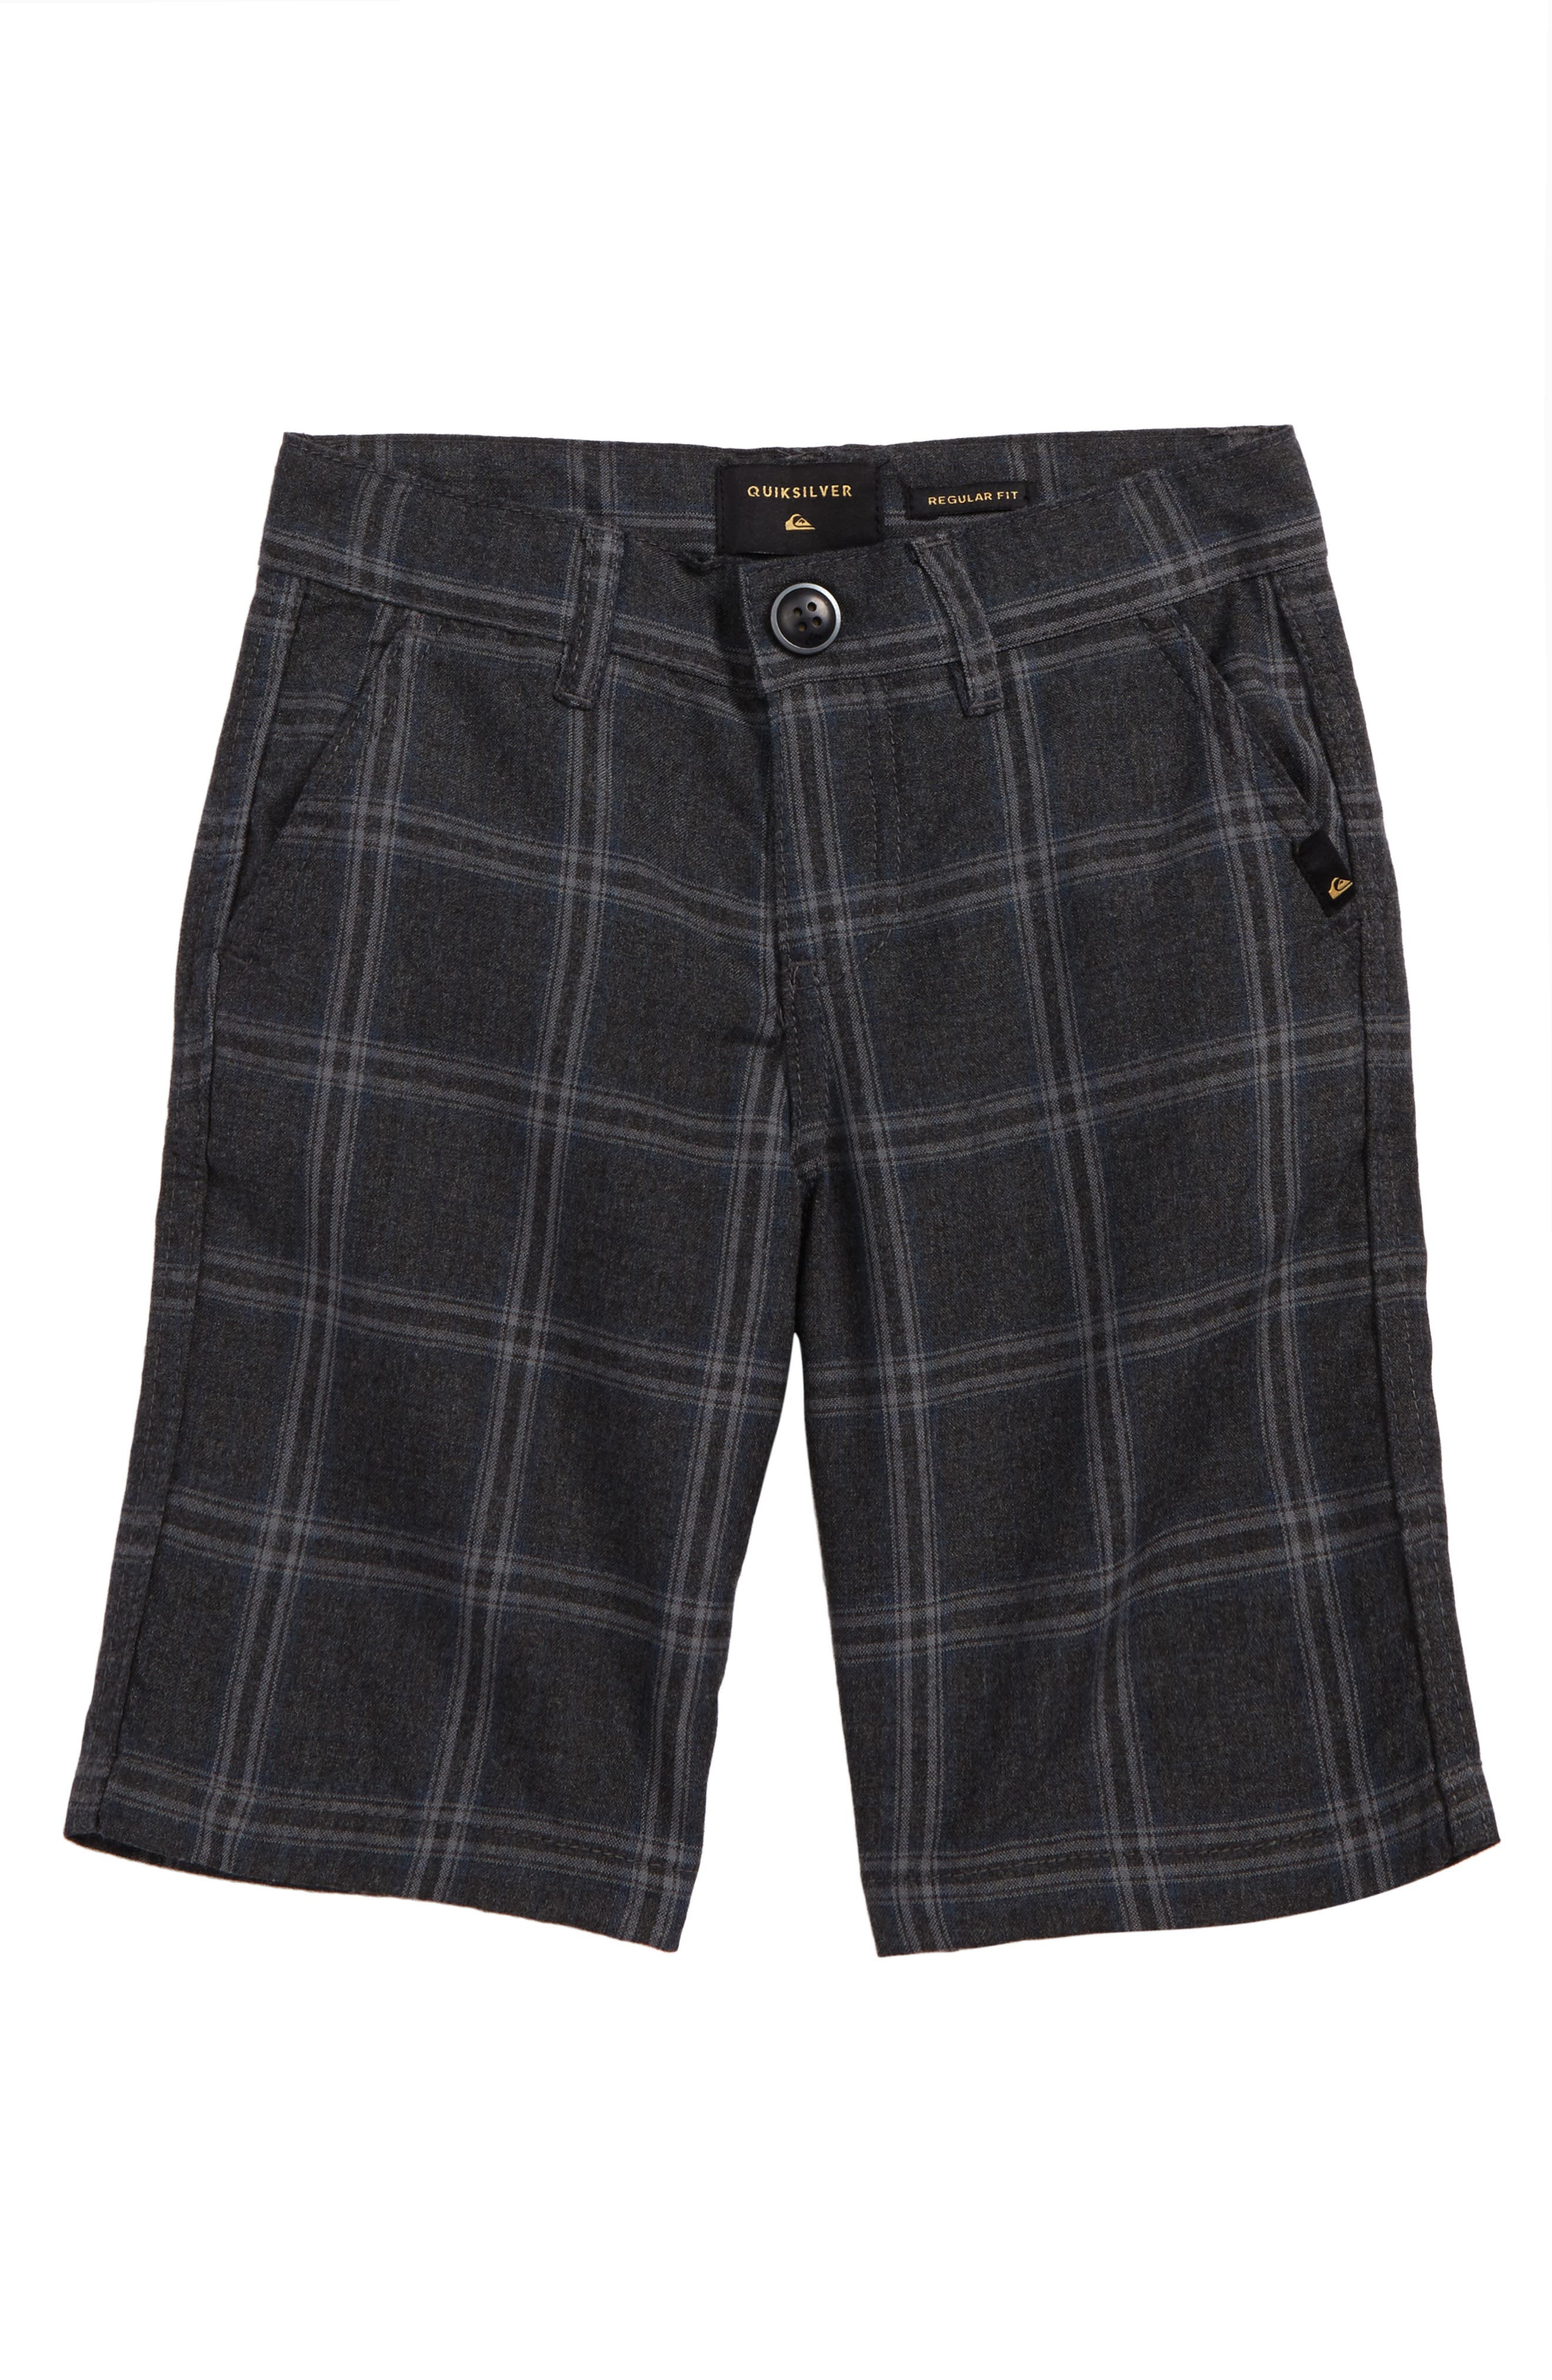 Regeneration Plaid Shorts,                             Main thumbnail 1, color,                             020